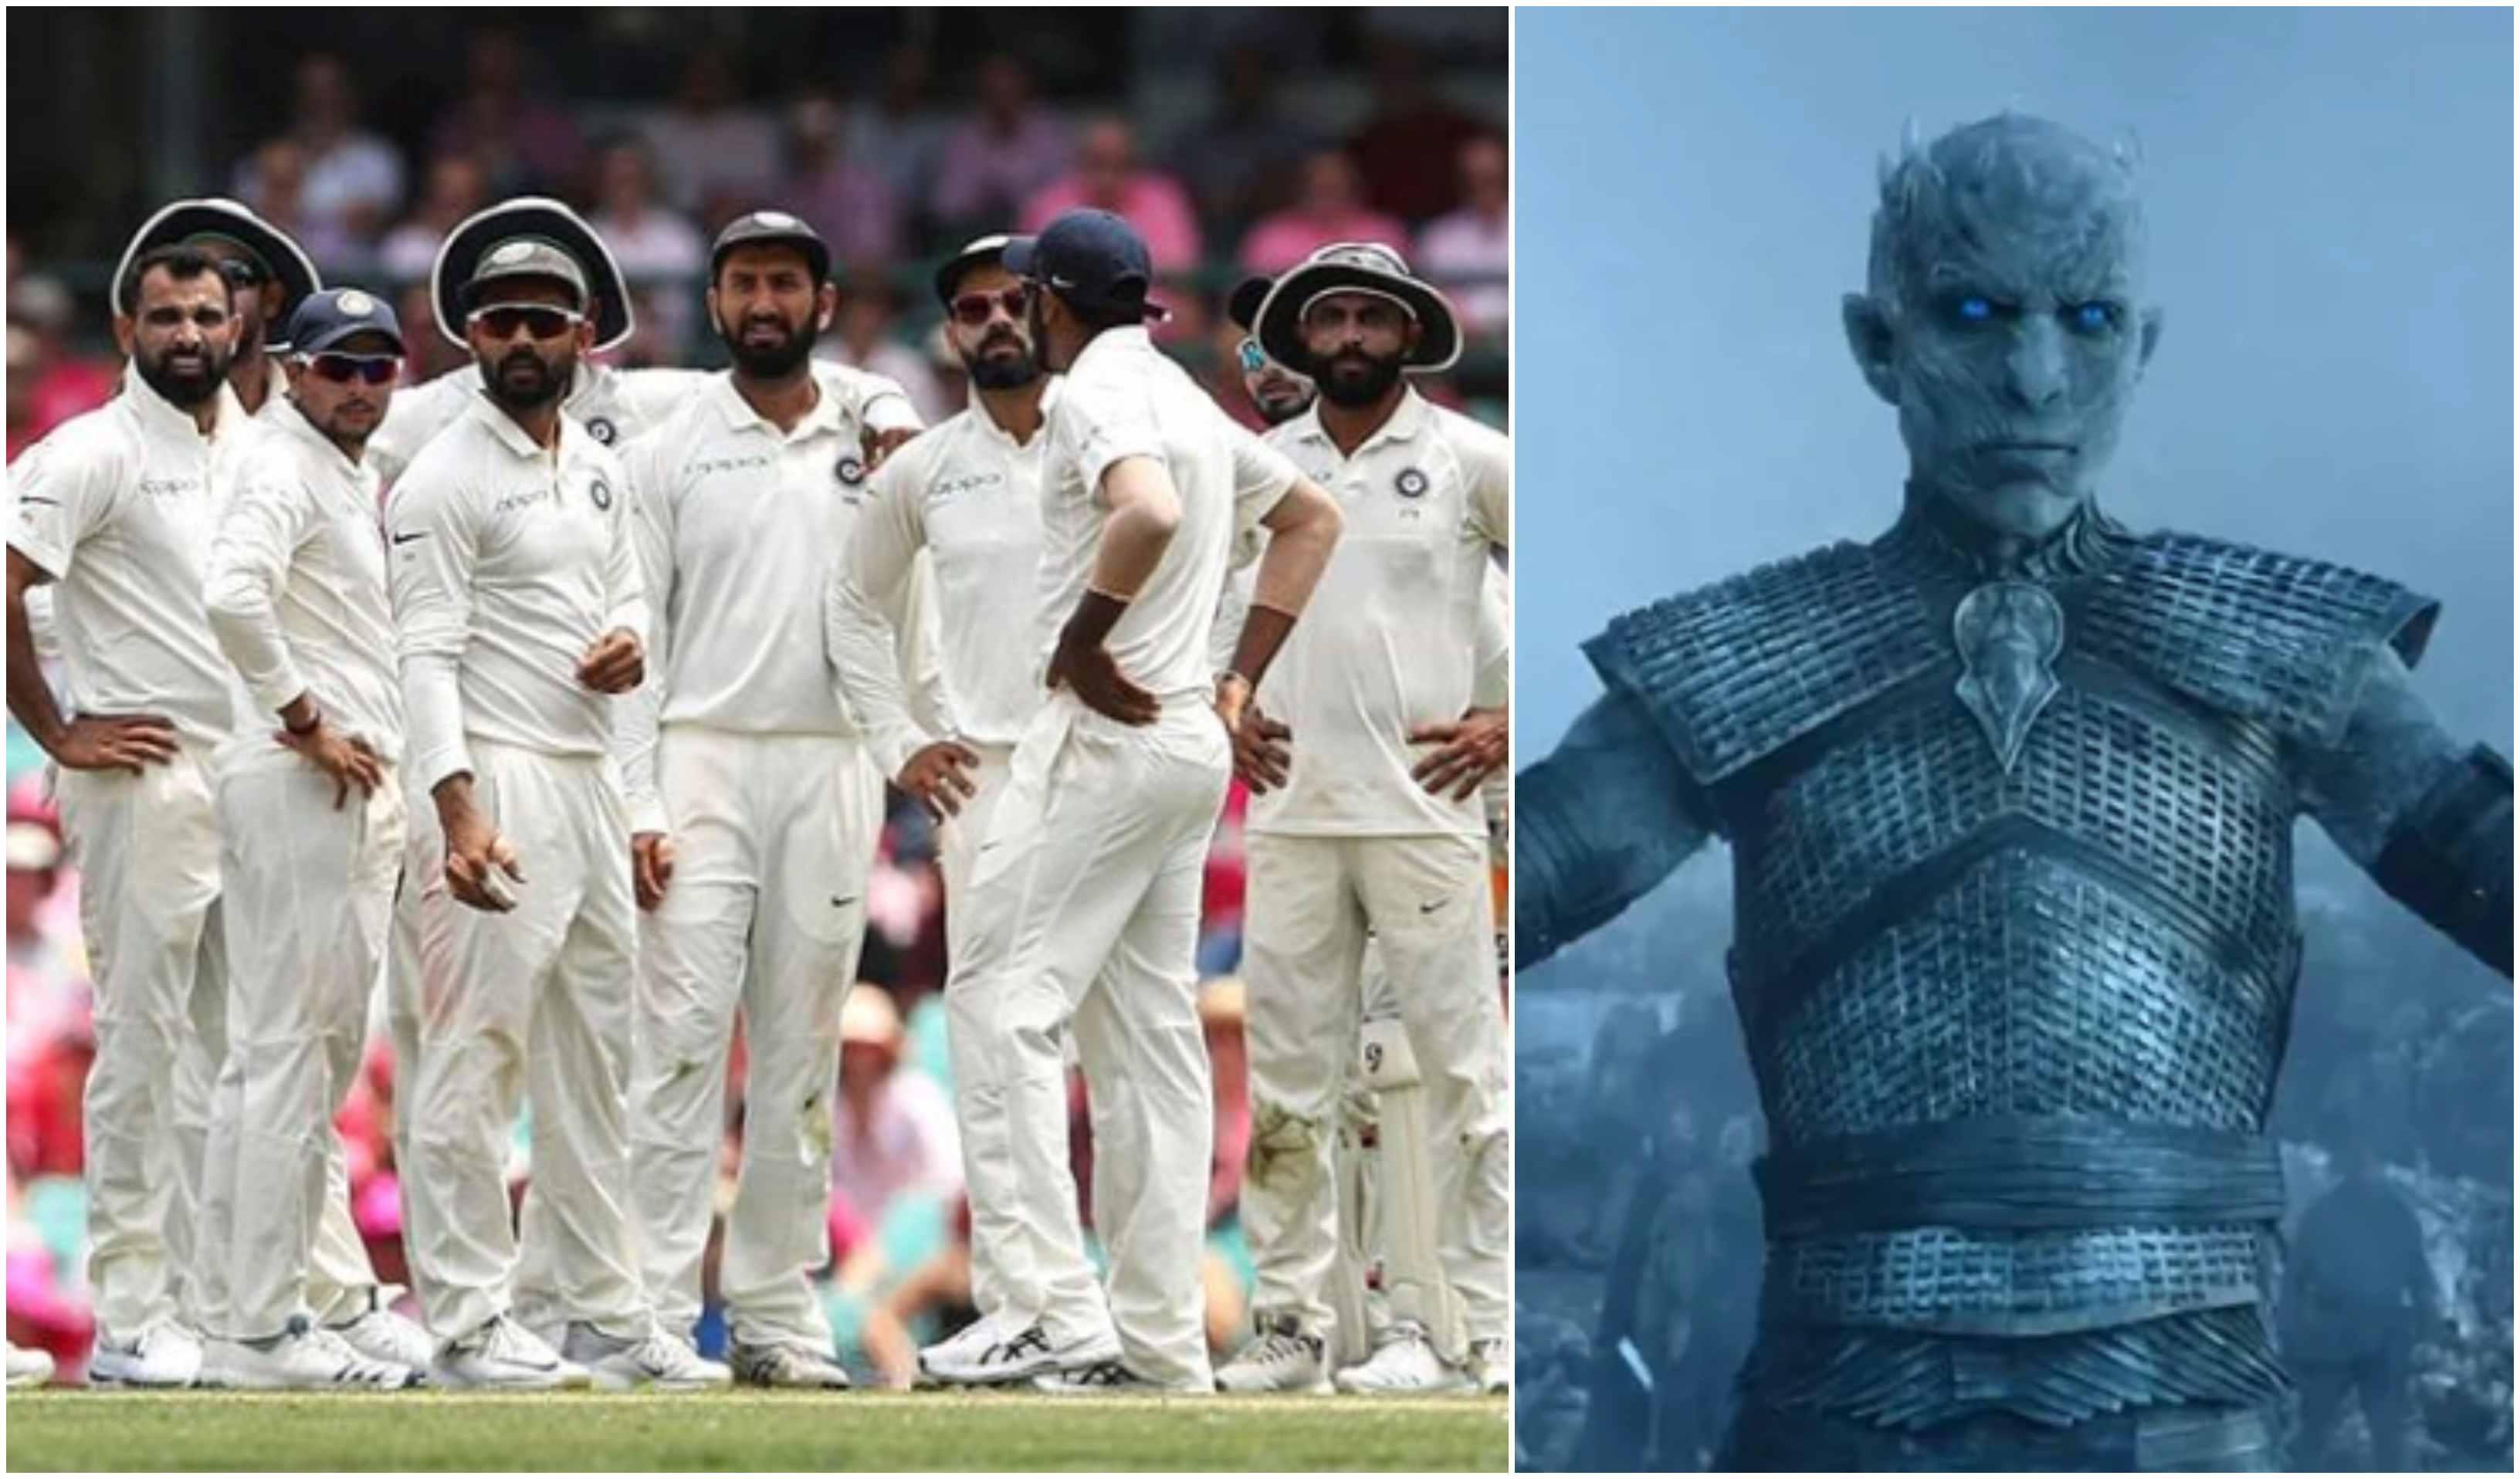 Cheteshwar Pujara, While Walker, Game of Thrones, Cricket, R Ashwin, NewsMobile, Mobile, News, India